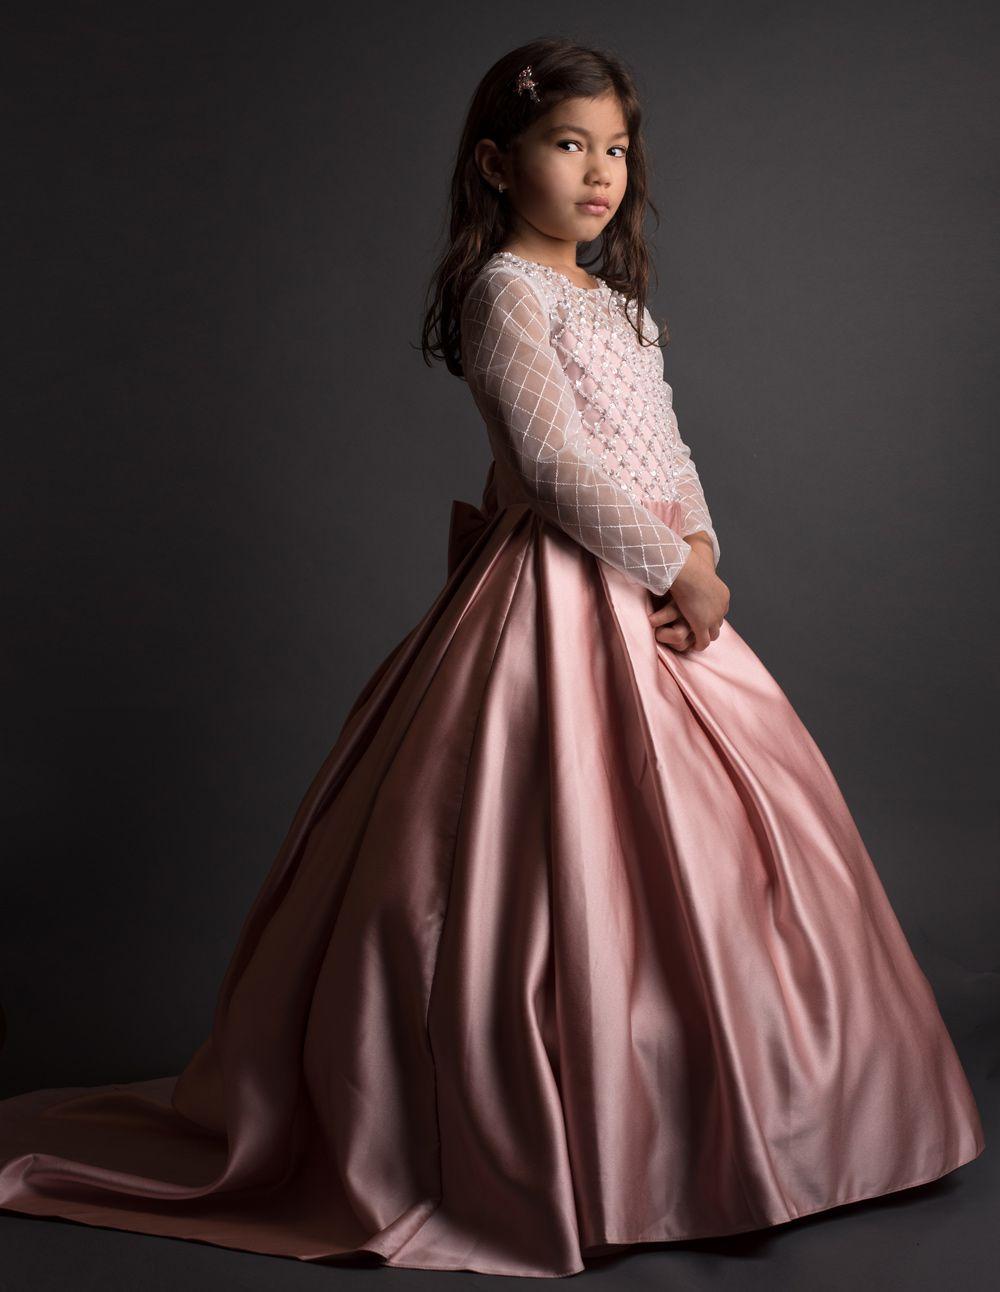 Pageant Flower Girl Dress Kids Wedding Bridesmaid Gown Formal Dresses UK Stock